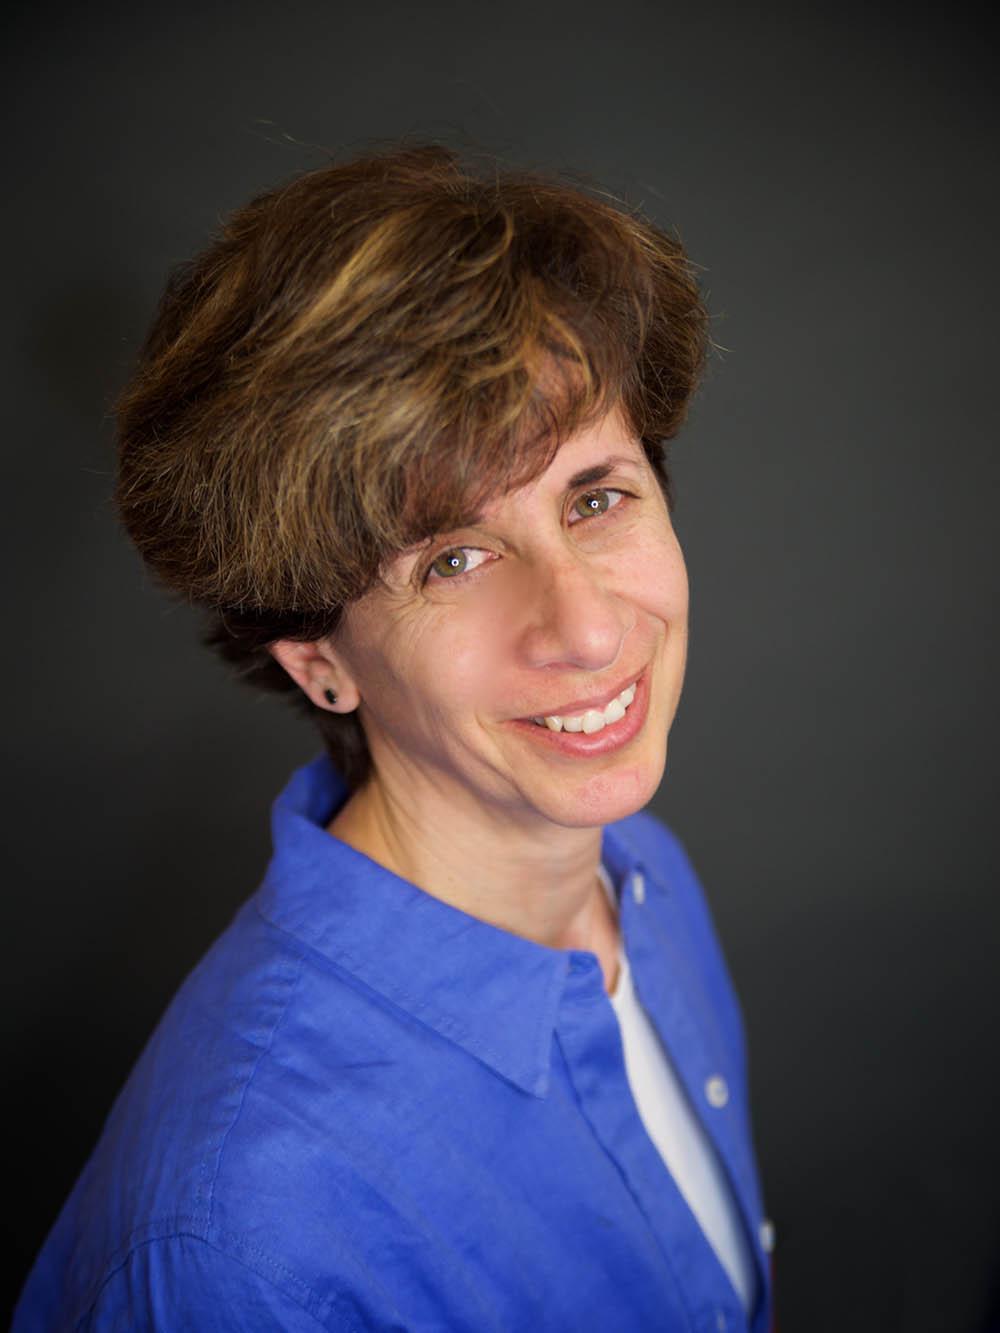 Bridget Borsa<br/>Information Technology Manager